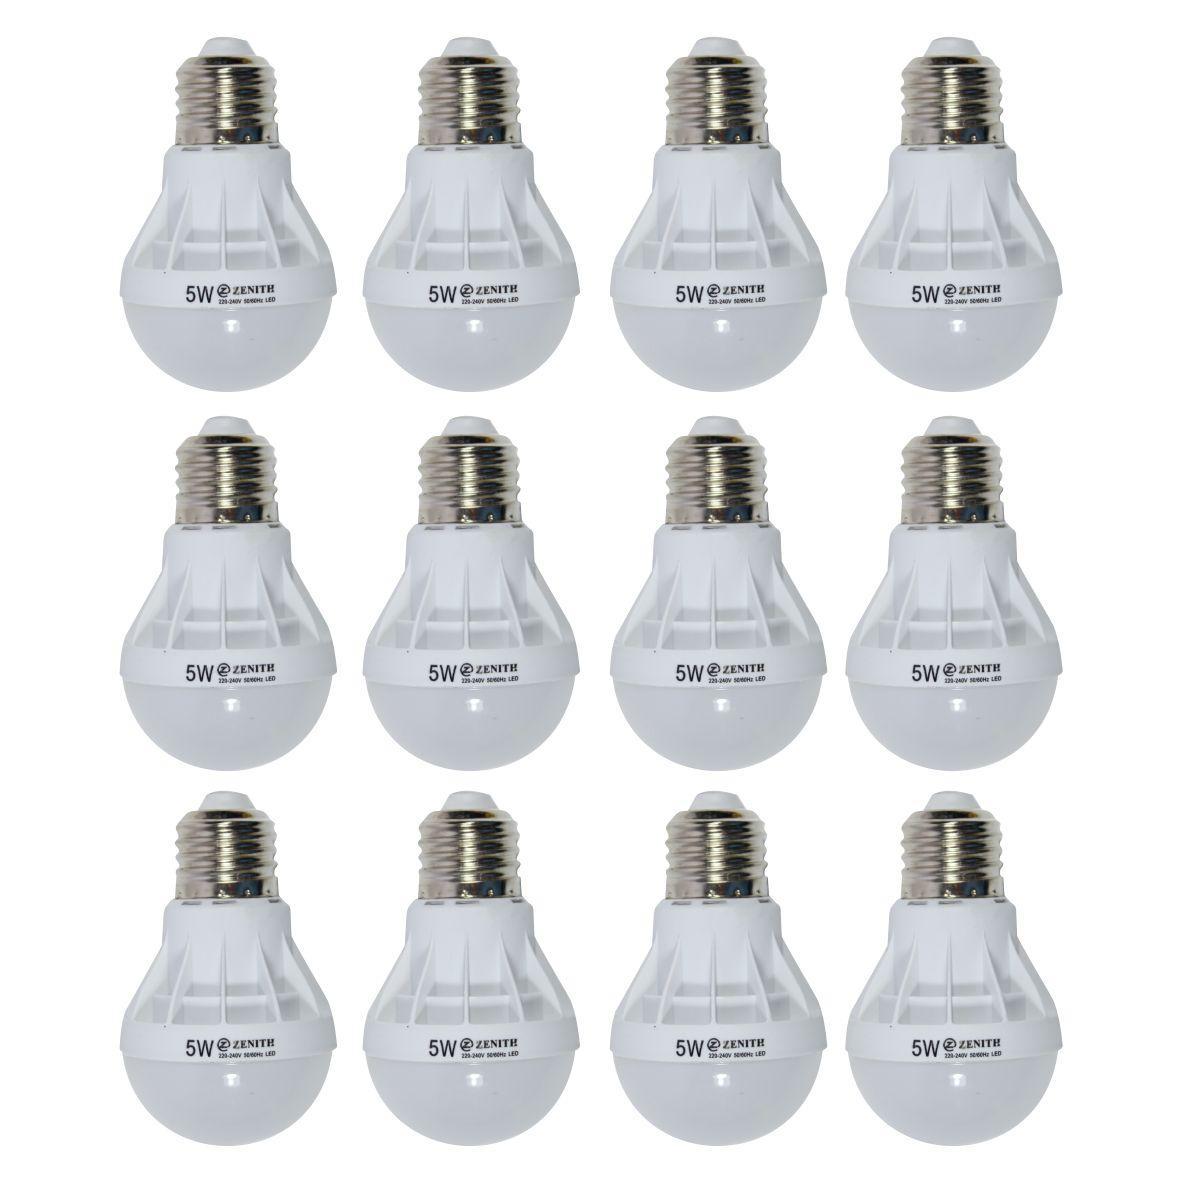 WEITECH LAMPU BOHLAM LED ZENITH HEMAT ENERGI DAN AWET 5 WATT 12 PCS